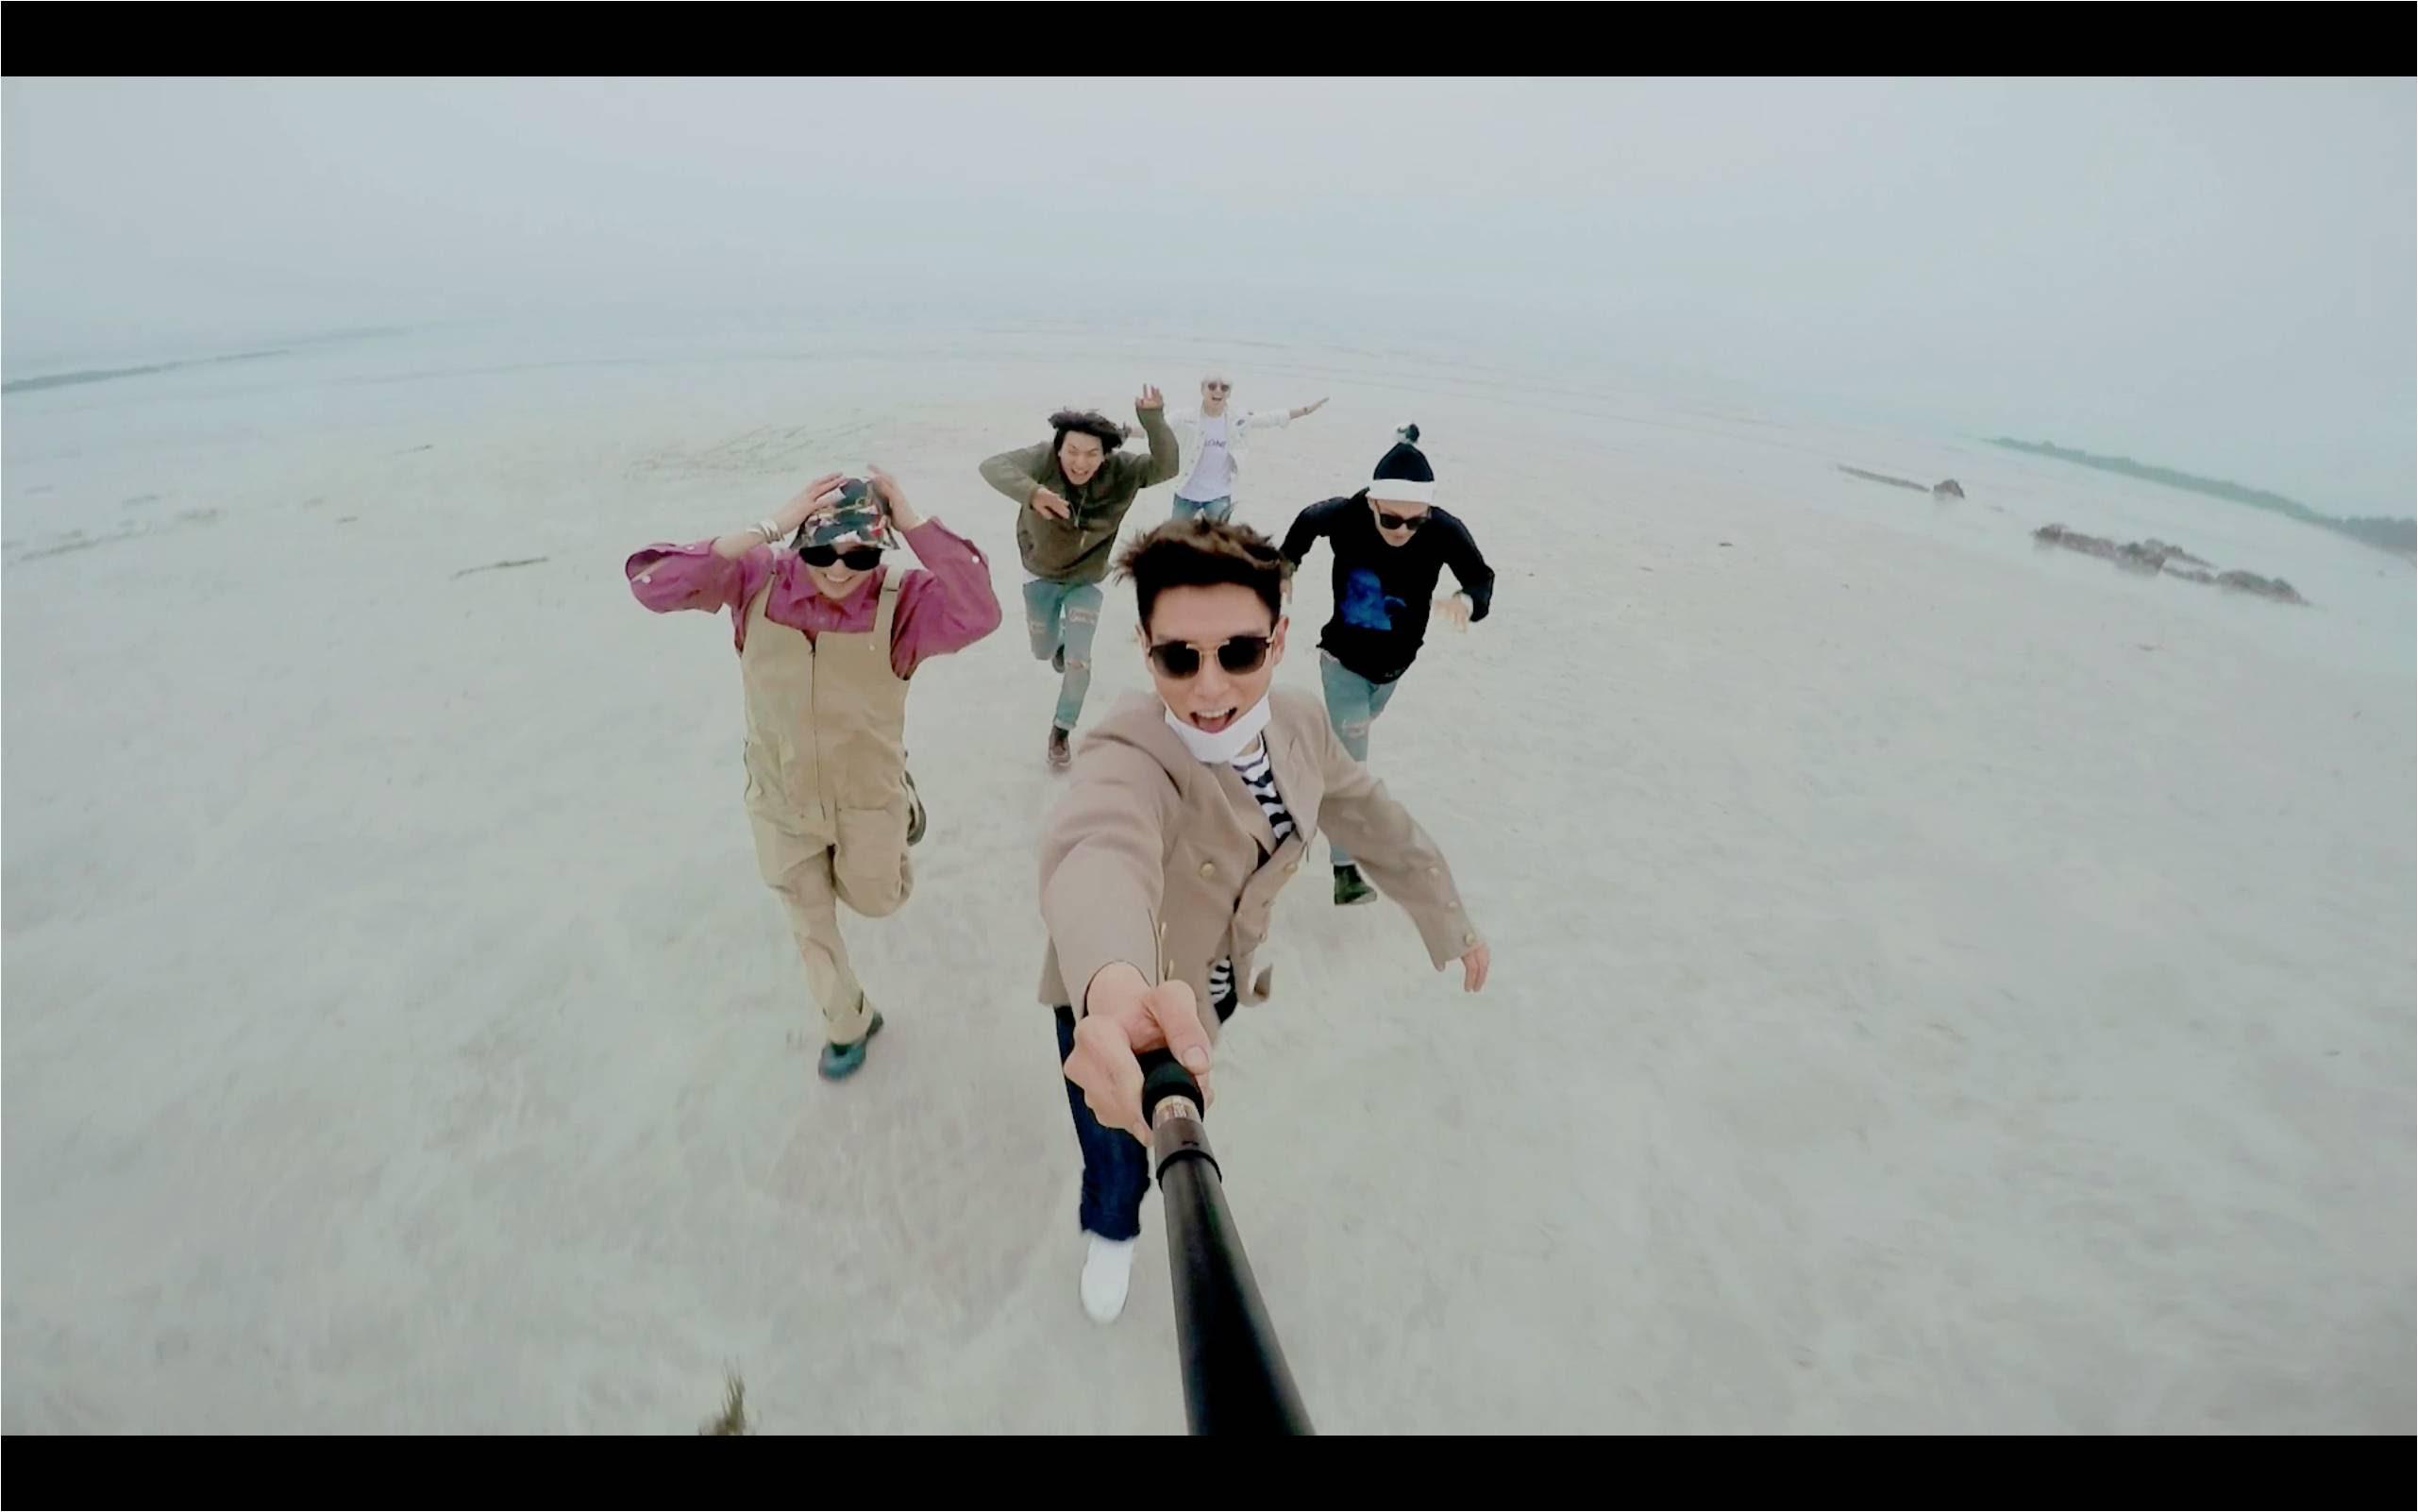 BIGBANG〈WE LIKE 2 PARTY〉 作詞:KUSH, T.O.P, TEDDY, G-DRAGON 作曲:서원진, KUSH, TEDDY, G-DRAGON